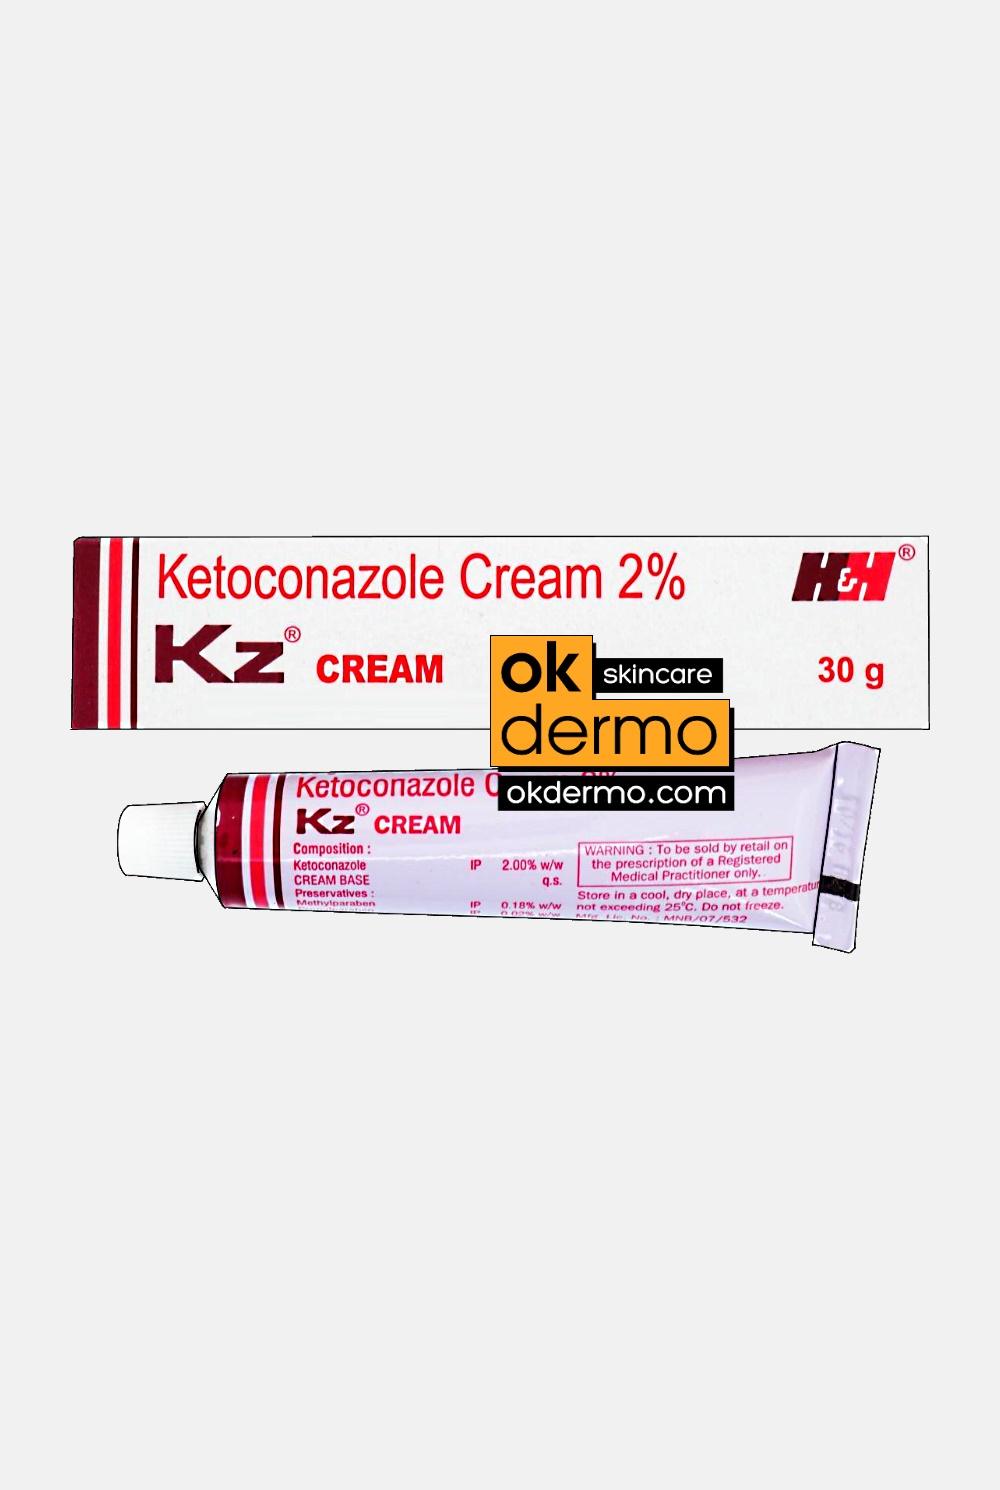 Fungus Treatment Ketoconazole Cream Order Online